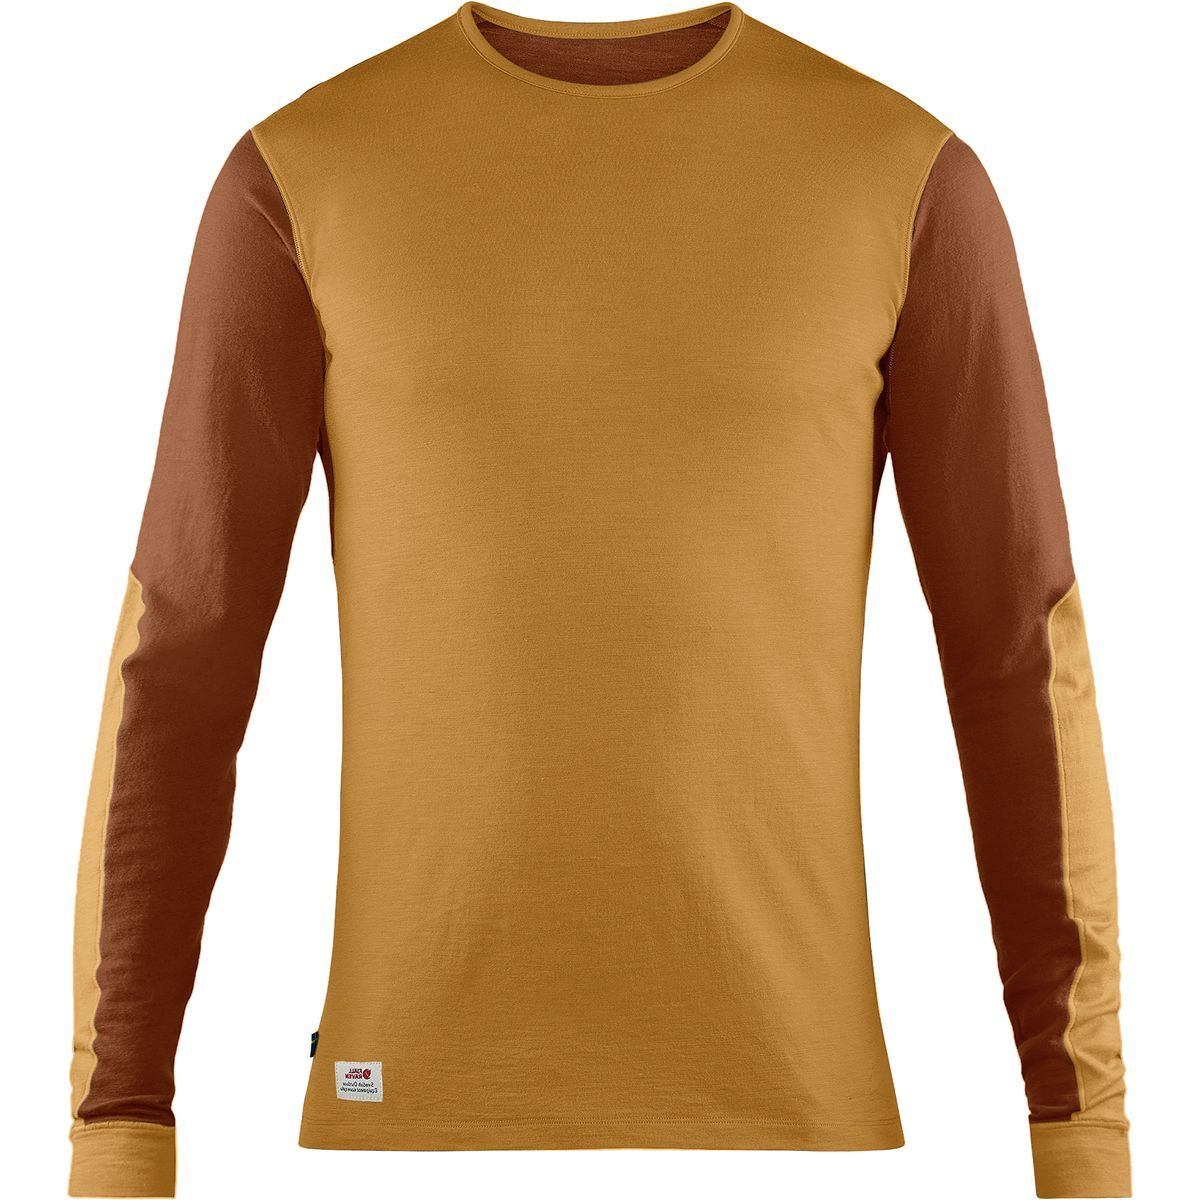 Fjallraven Keb Wool Long-Sleeve T-Shirt - Men's